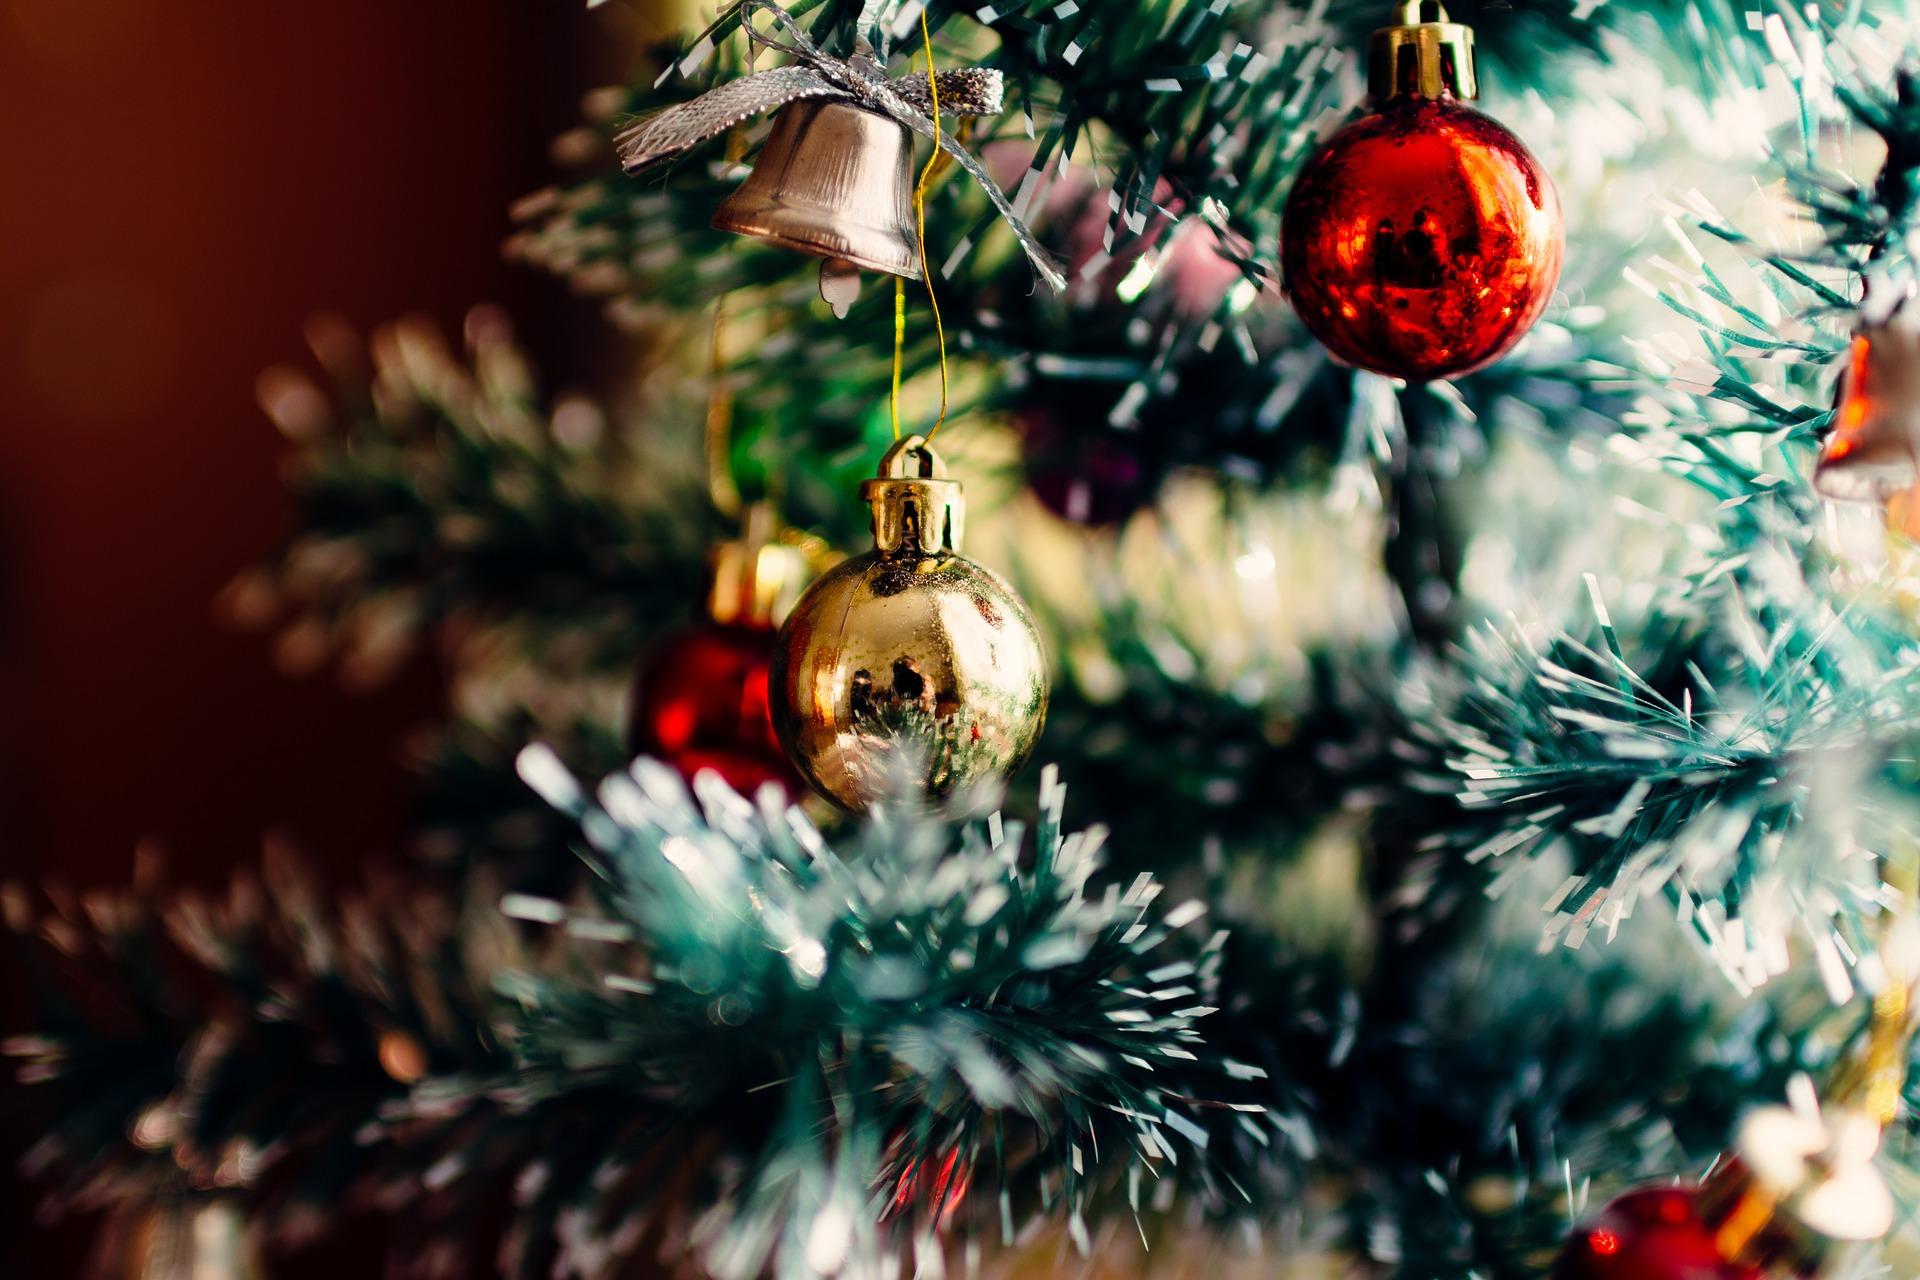 Christmas Tree Back.Christmas Tree Economies Or Fashions And Local Economic